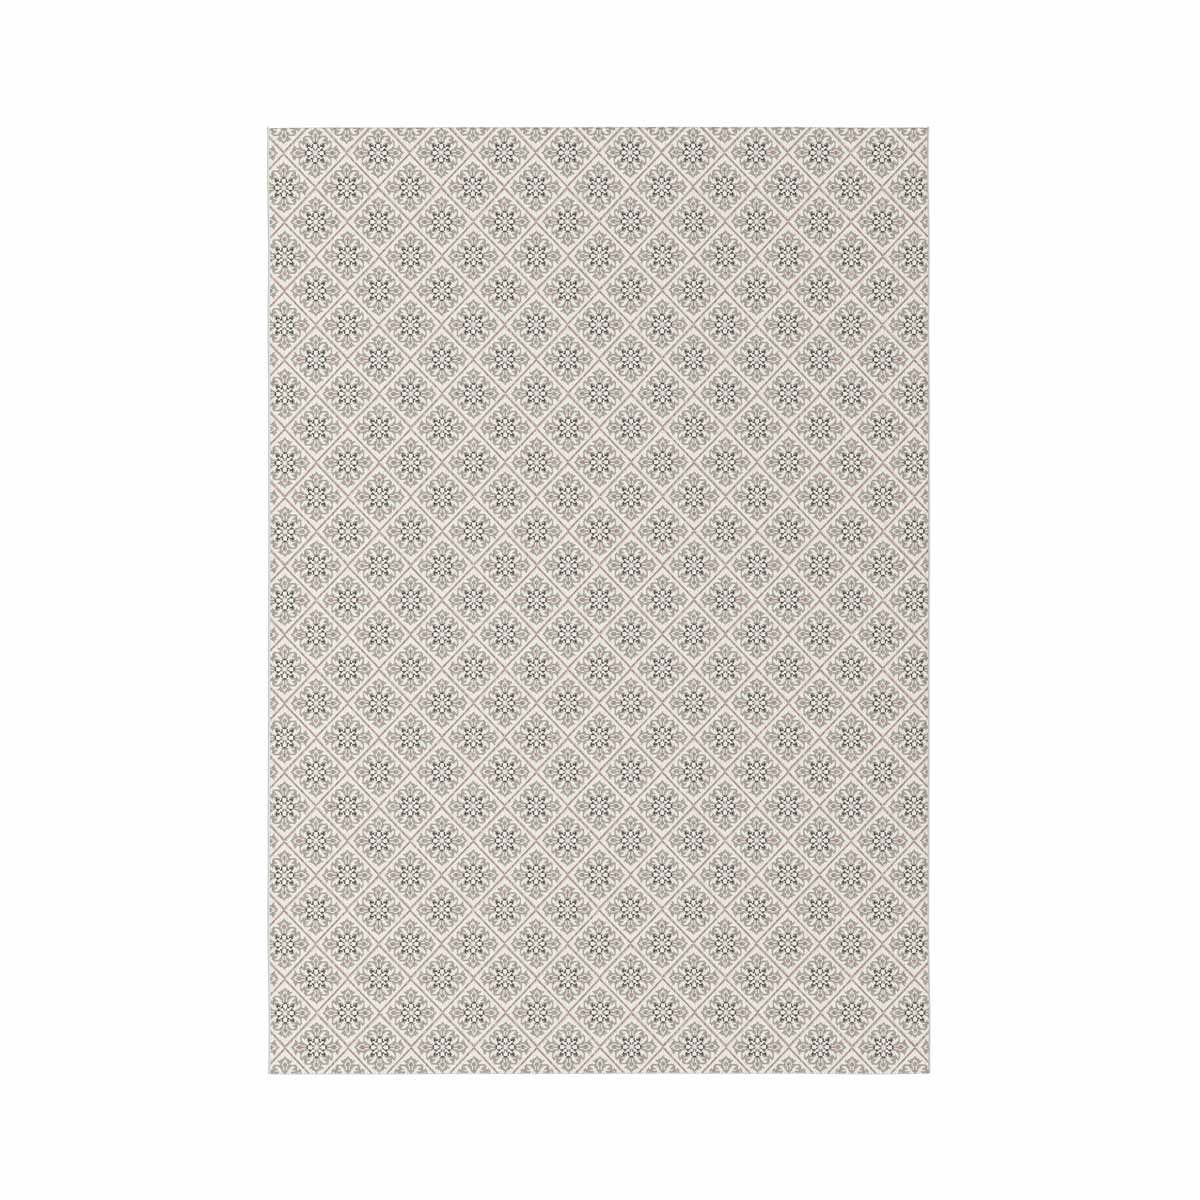 Tapis carreaux ciment rose et beige Ethnic 80x150 cm